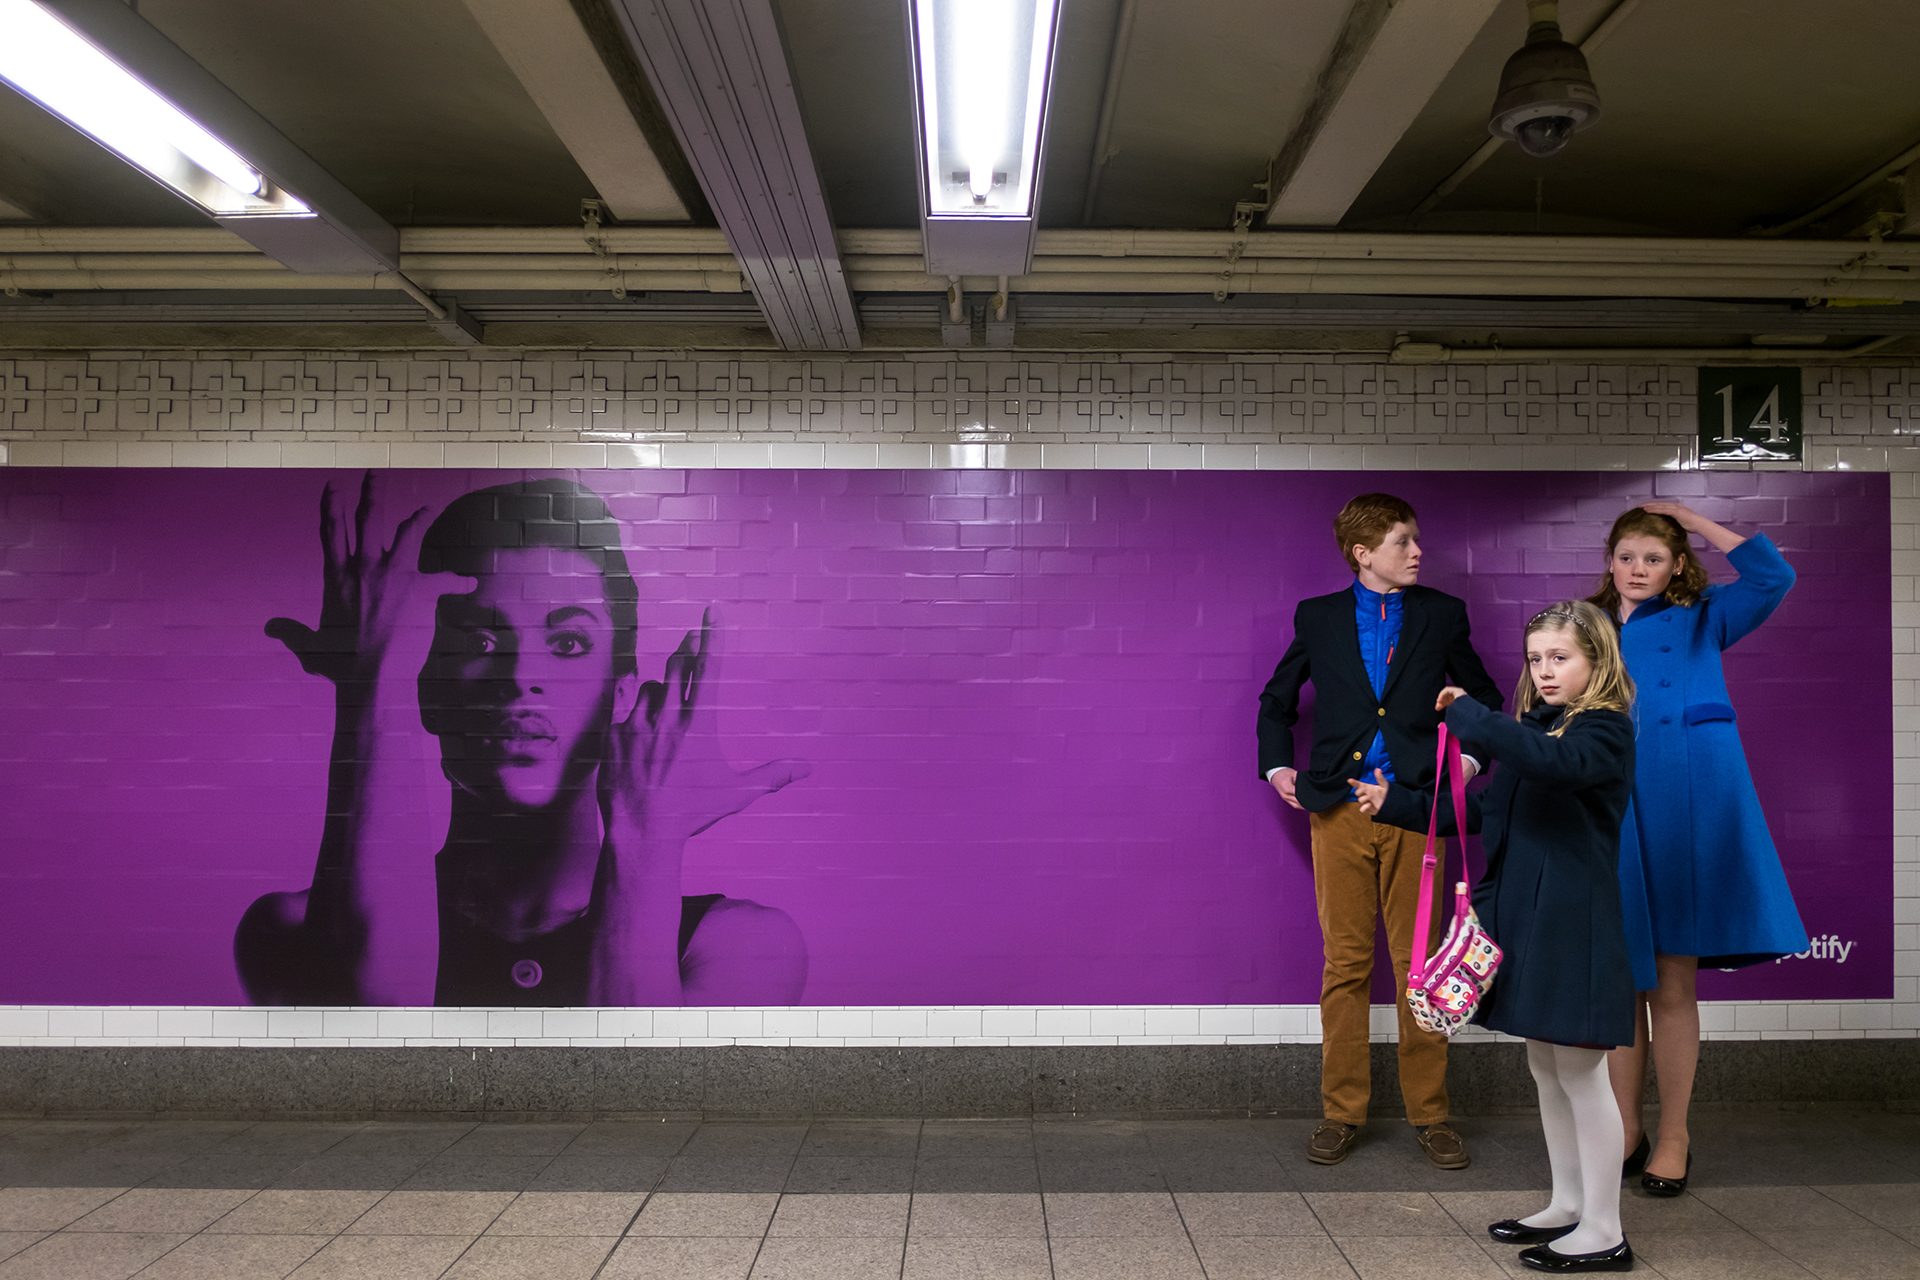 Richard Koek - Union Square, Manhattan - Courtesy Eduard Planting Gallery